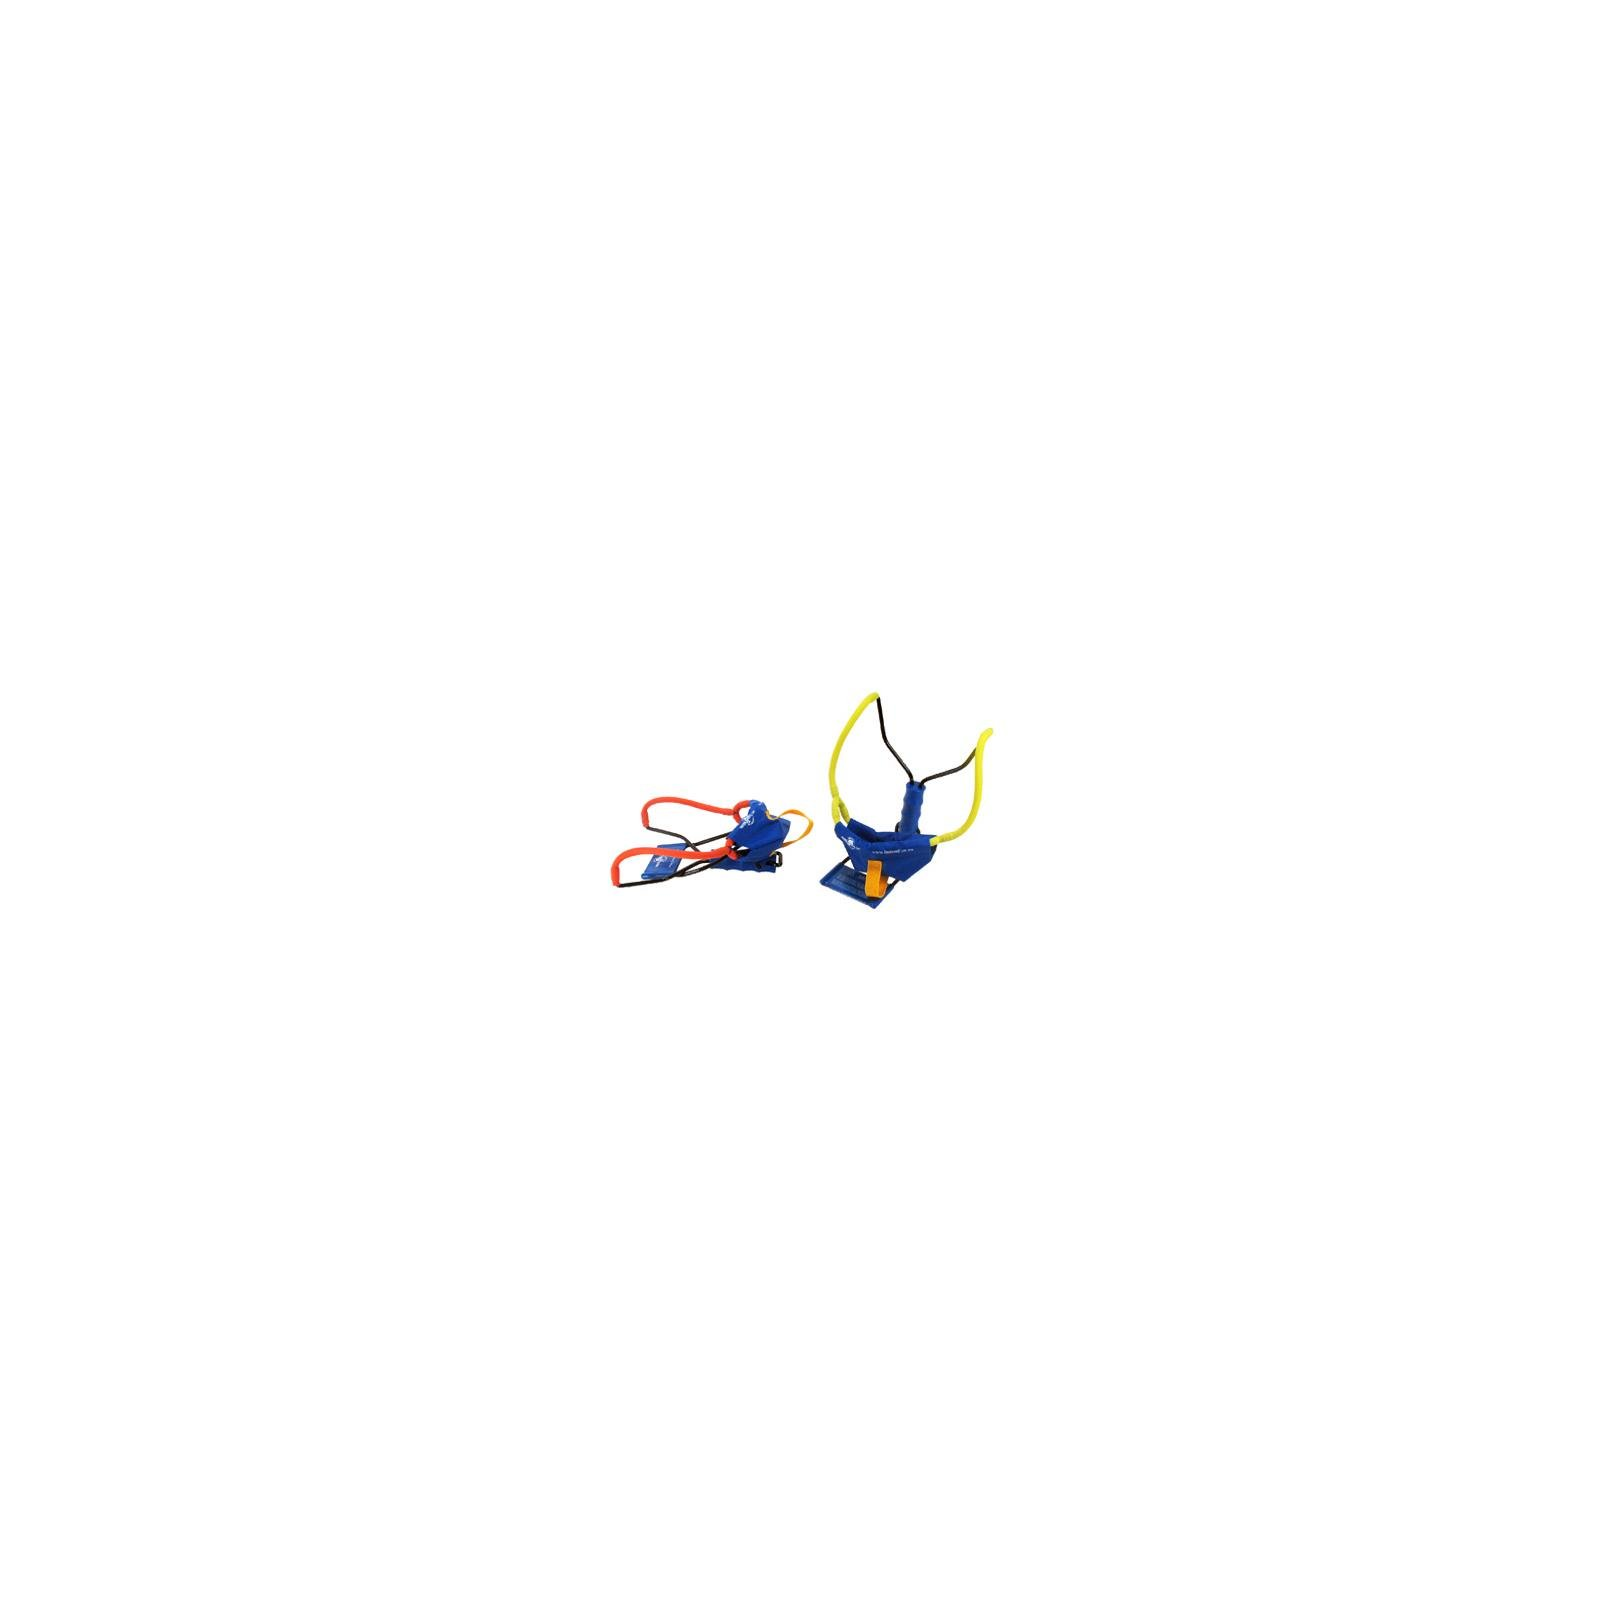 Water Sports 80082 Wrist Balloon Launcher Kit - Quantity 4